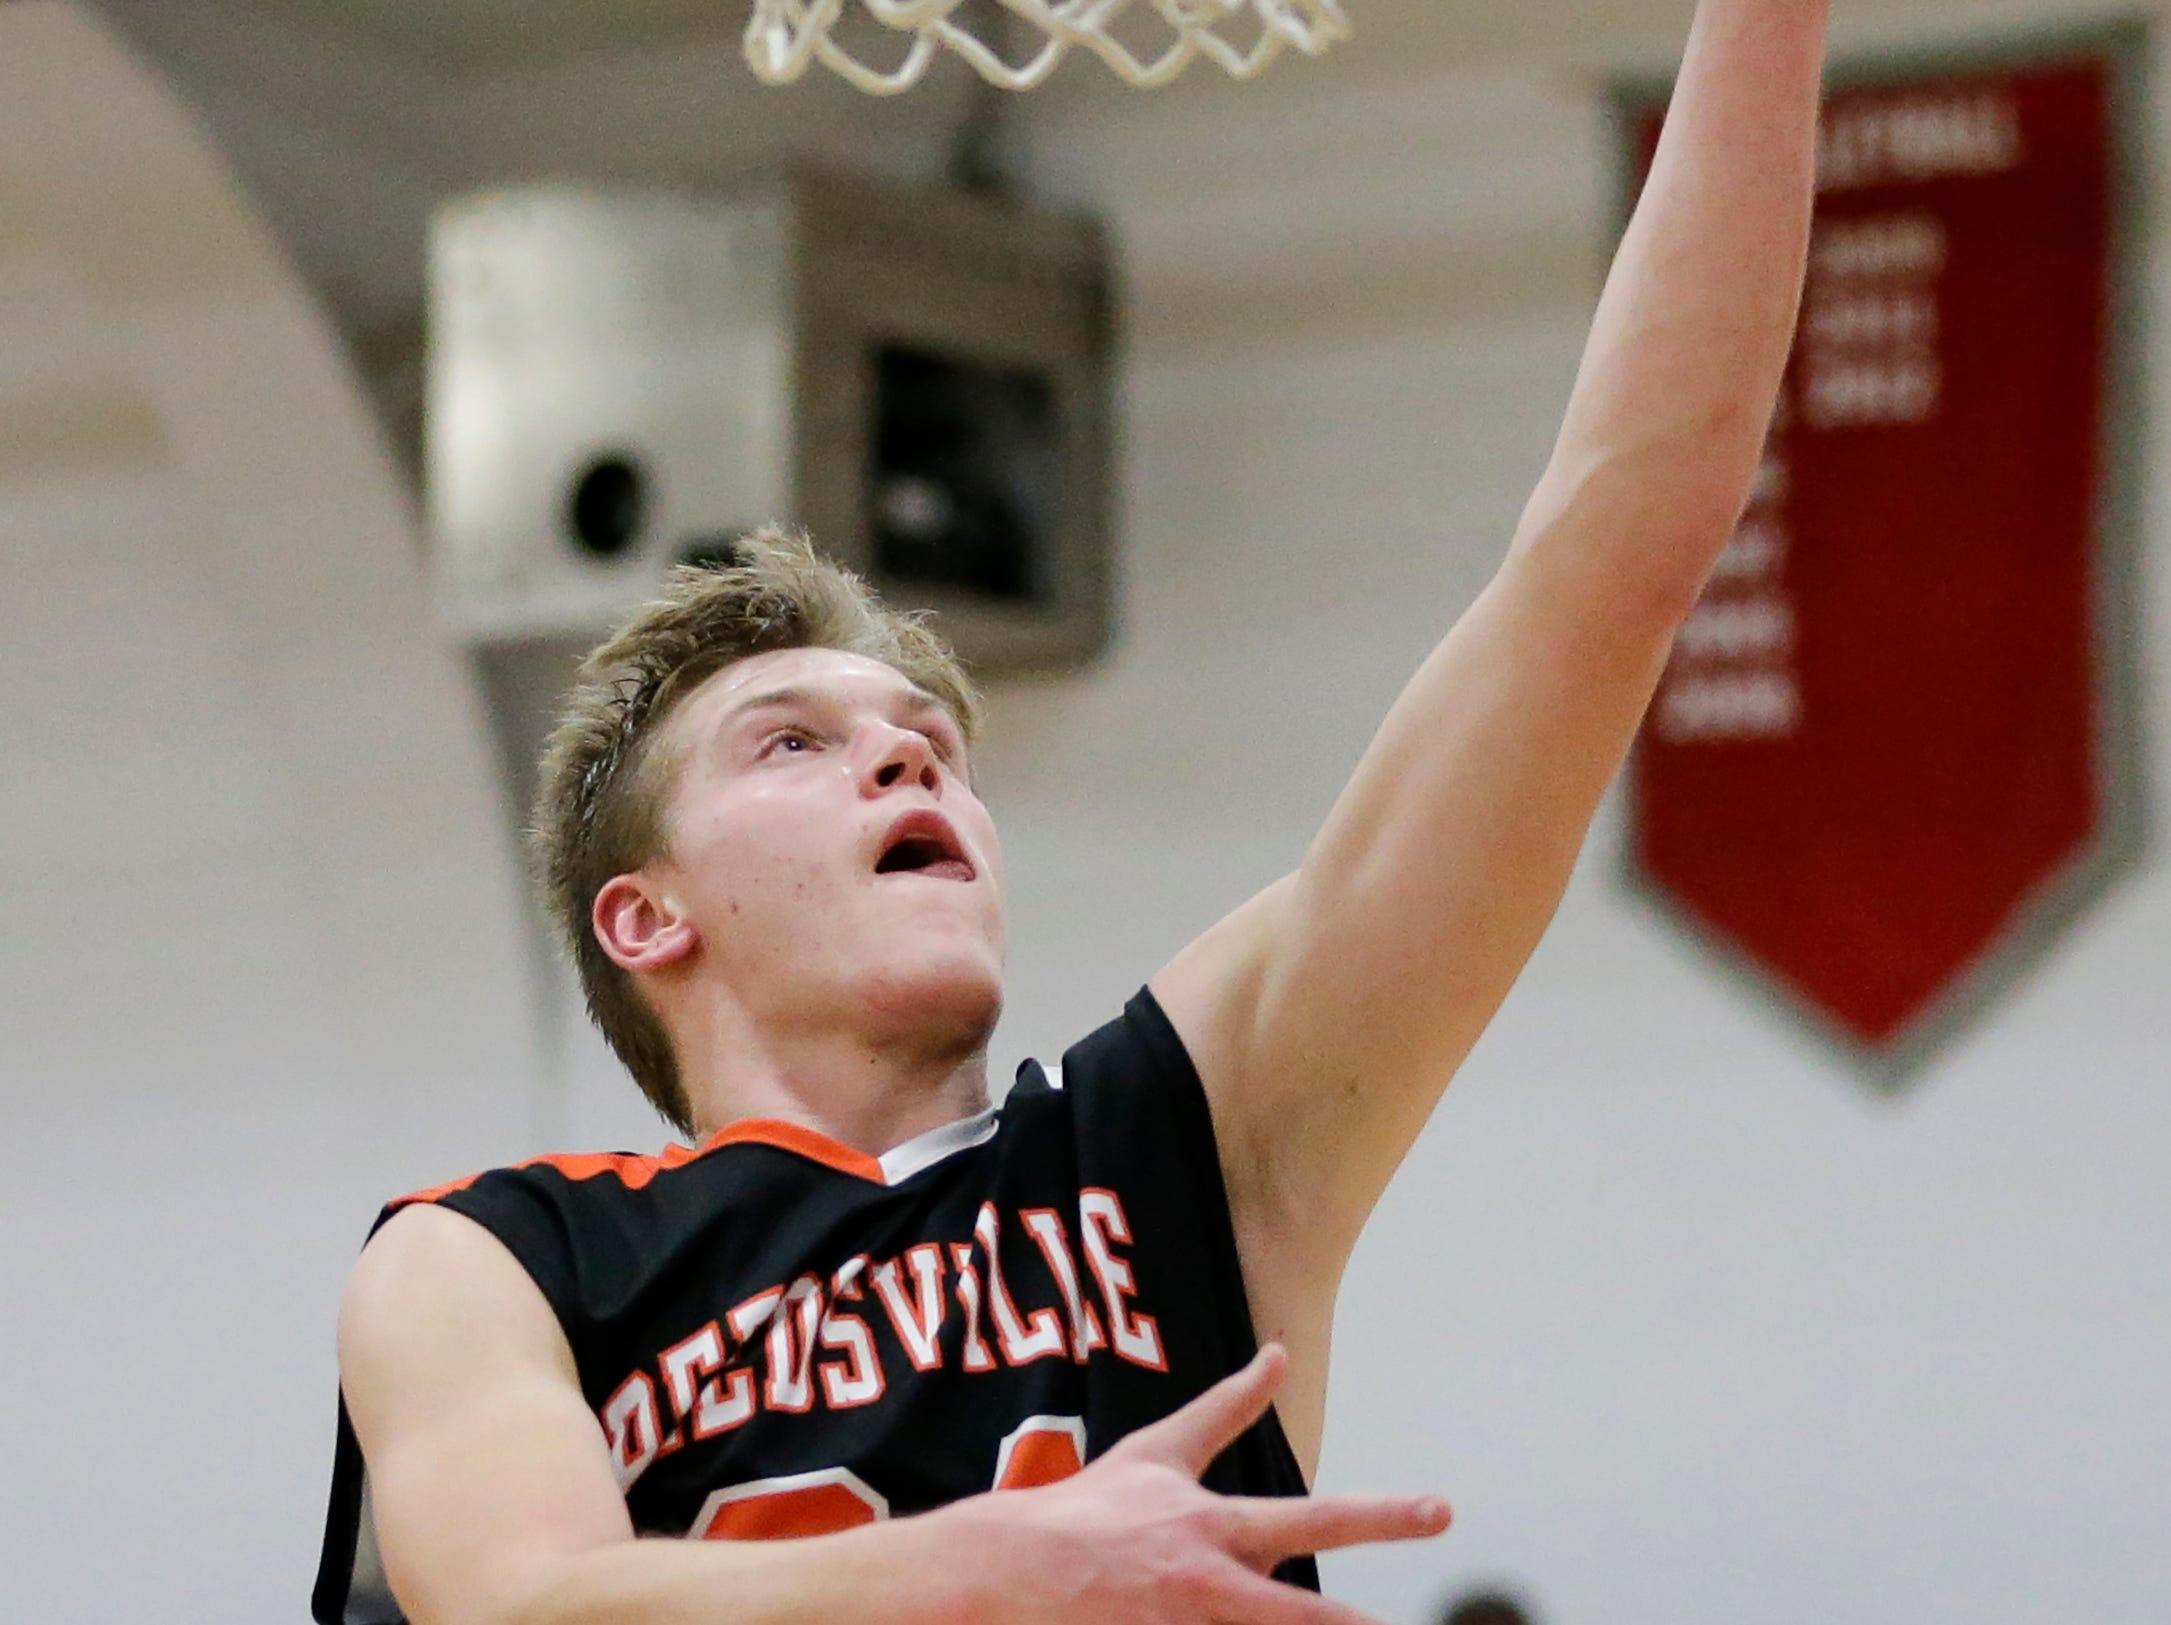 Reedsville's Braiden Dvorachek scores with a layup against Manitowoc Lutheran at Manitowoc Lutheran High School Thursday, December 20, 2018, in Manitowoc, Wis. Joshua Clark/USA TODAY NETWORK-Wisconsin